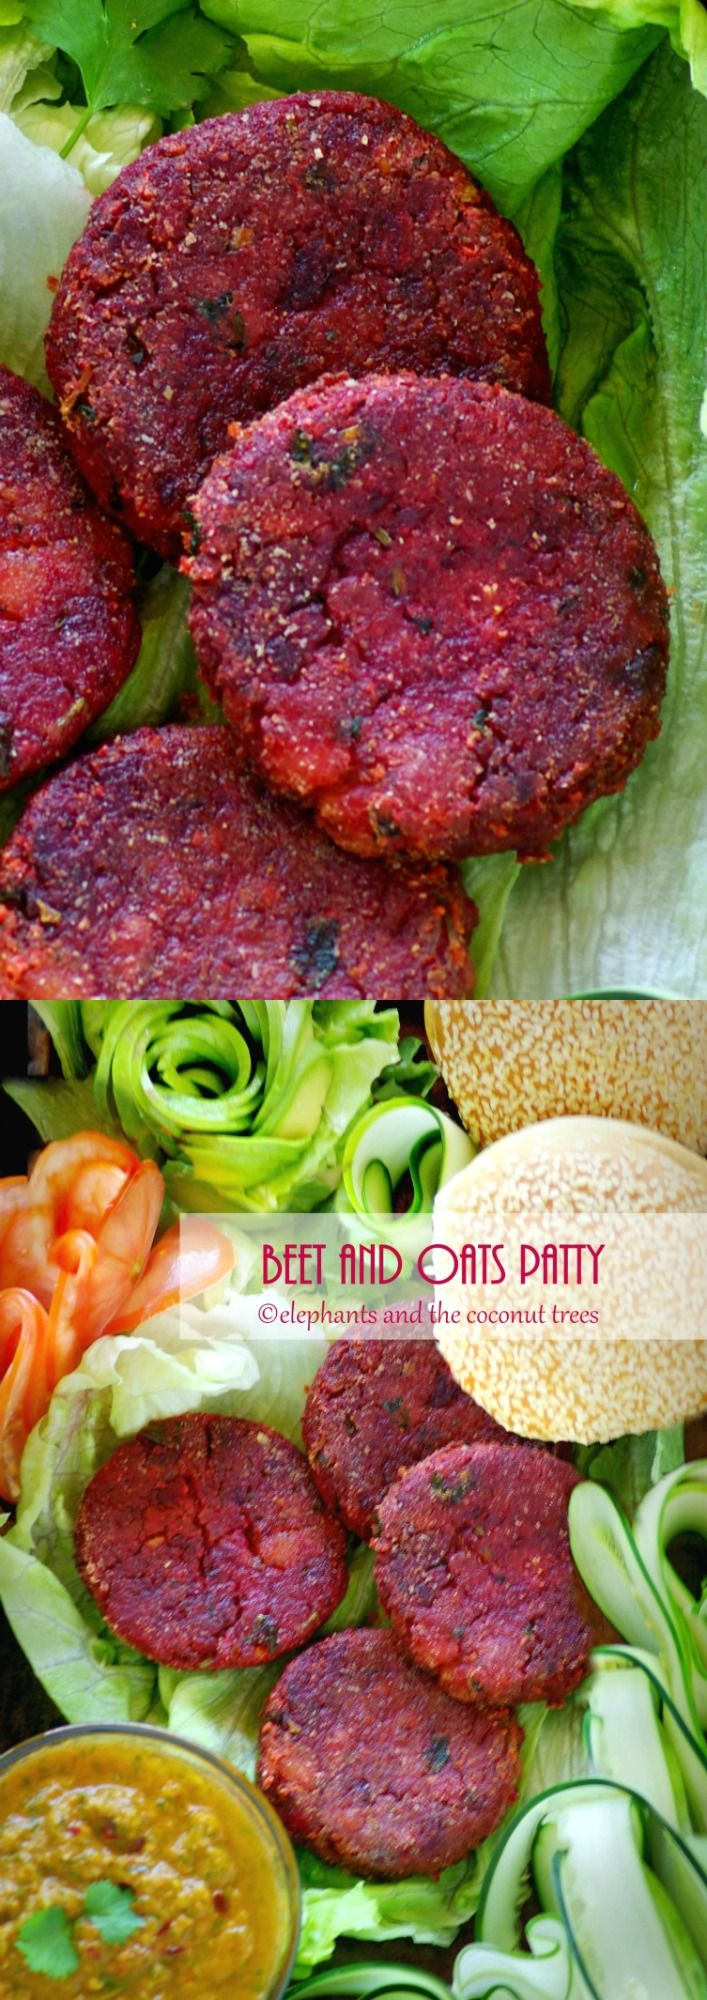 Beet and Oats Vegan Burger #Foodnetwork #FNDish  #SummerSoiree #vegan #veganburger